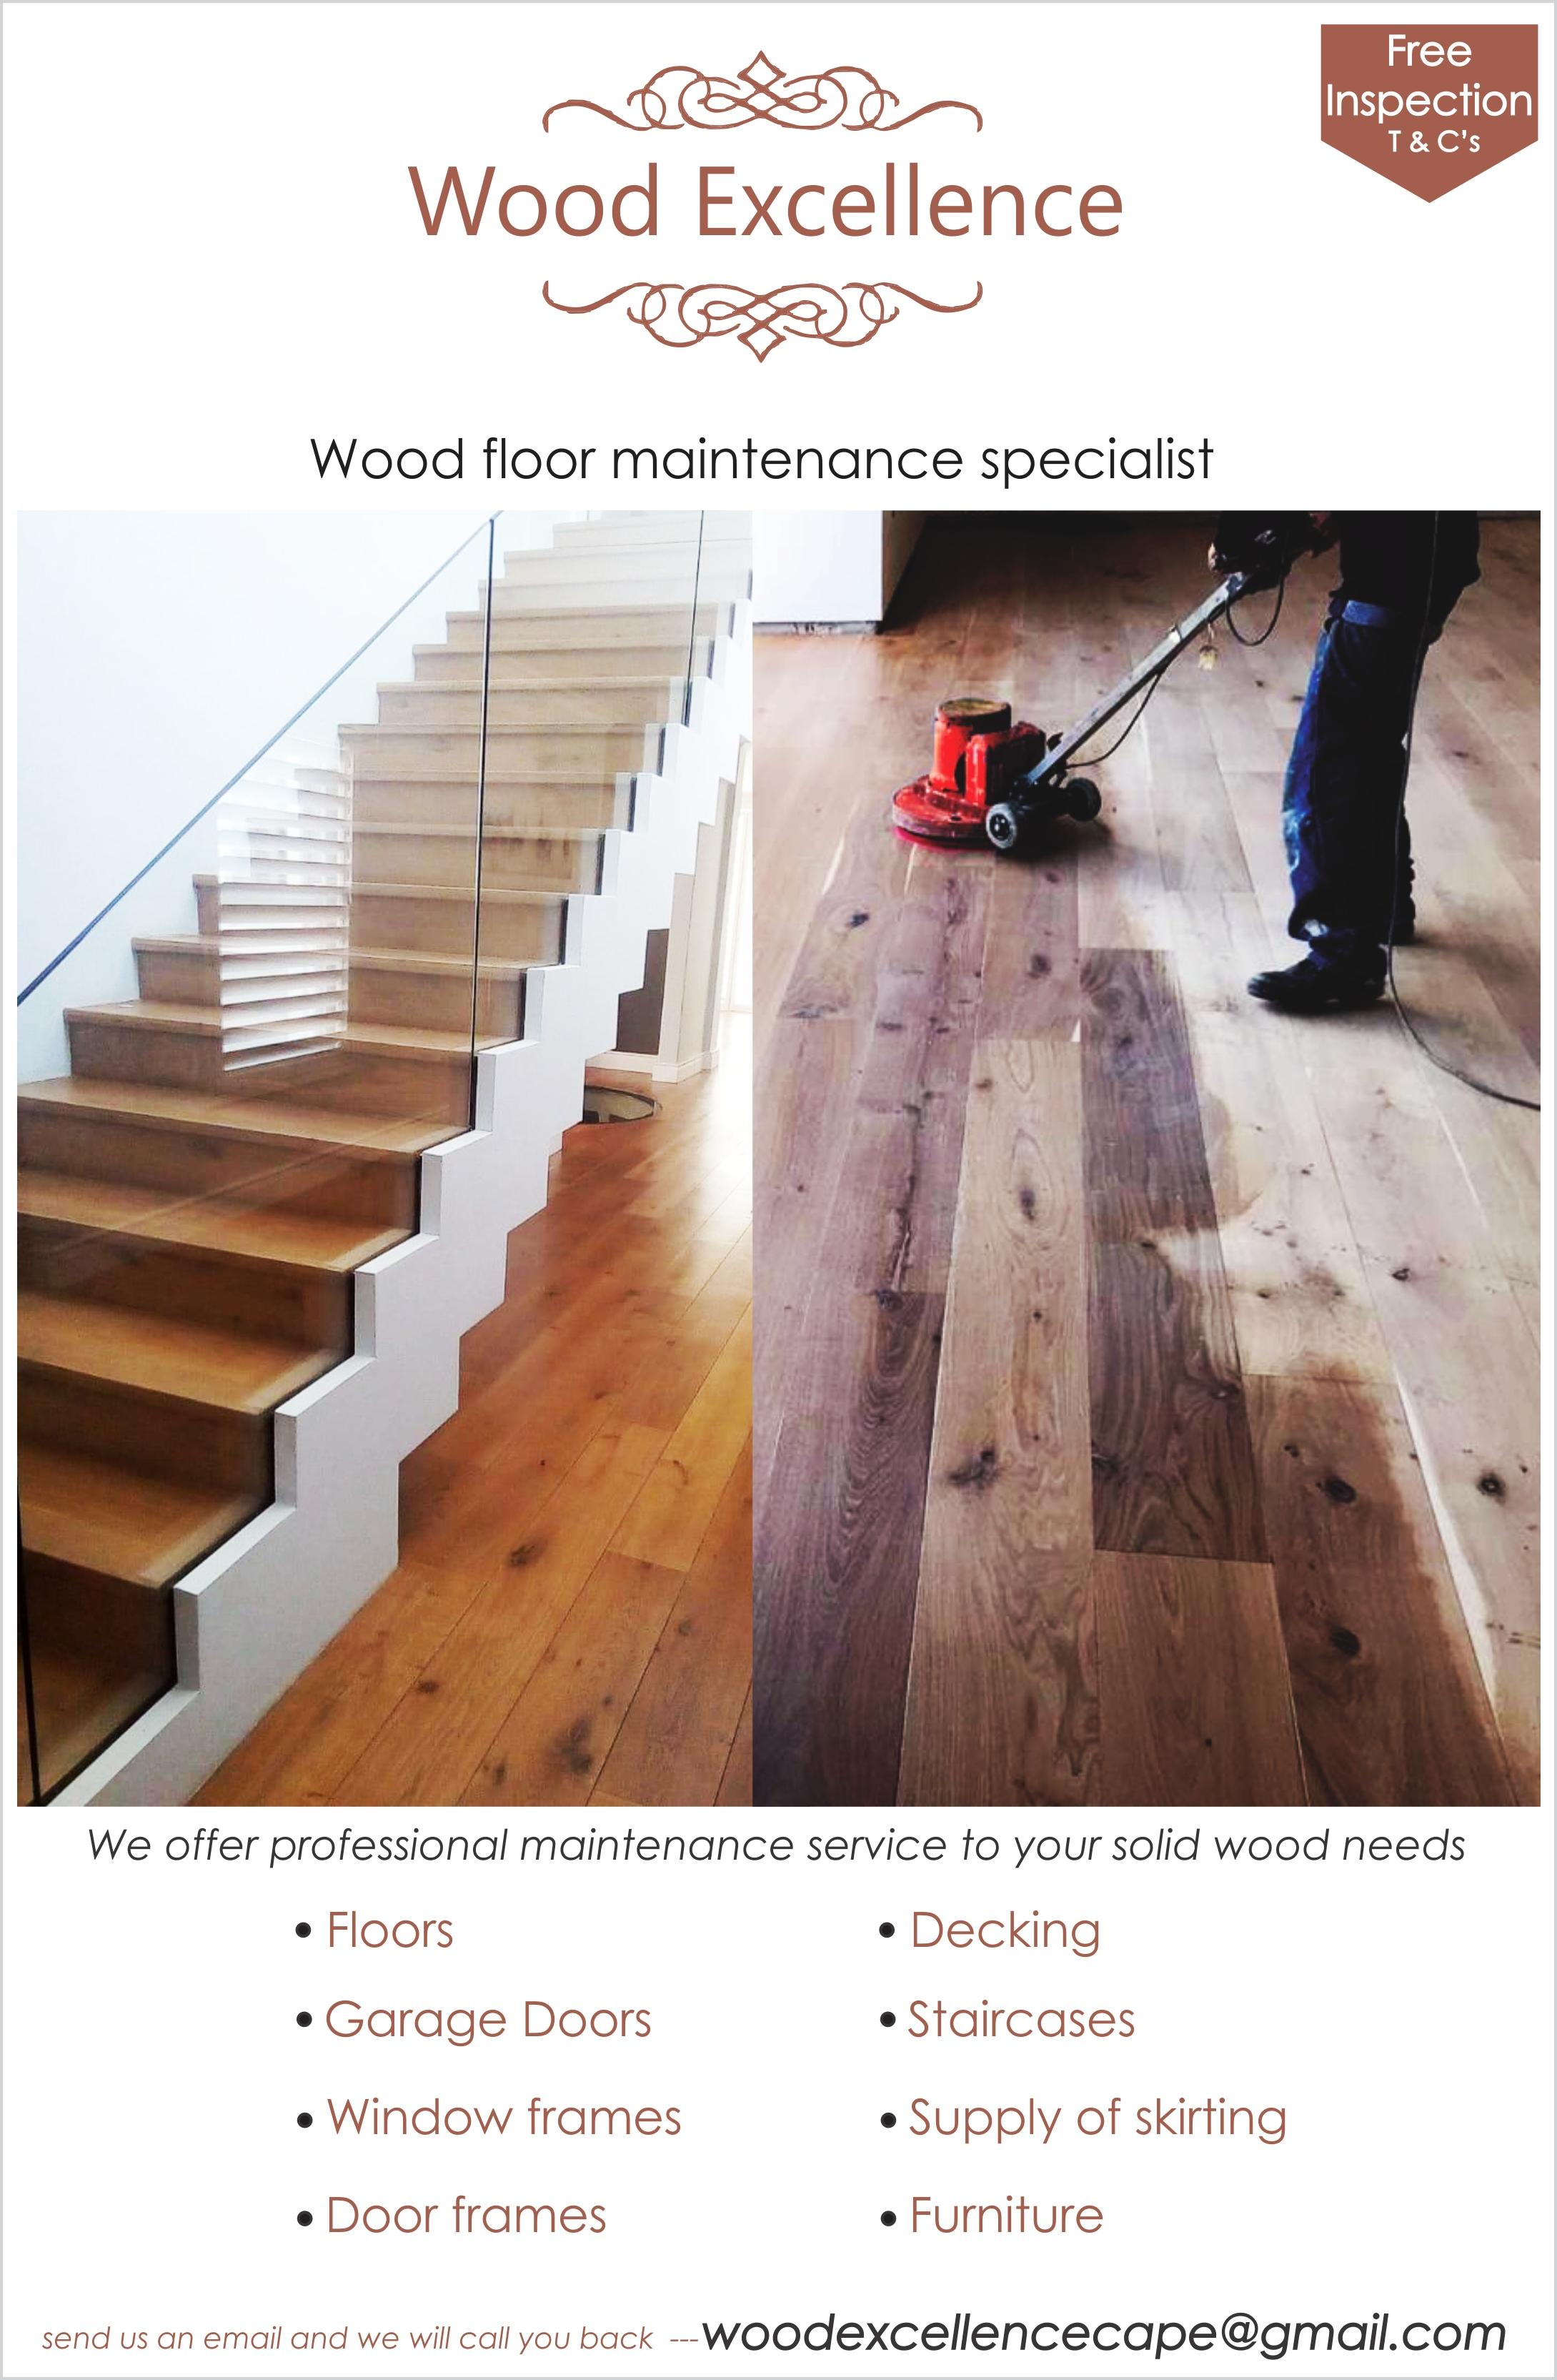 Wood floor maintenance specialist